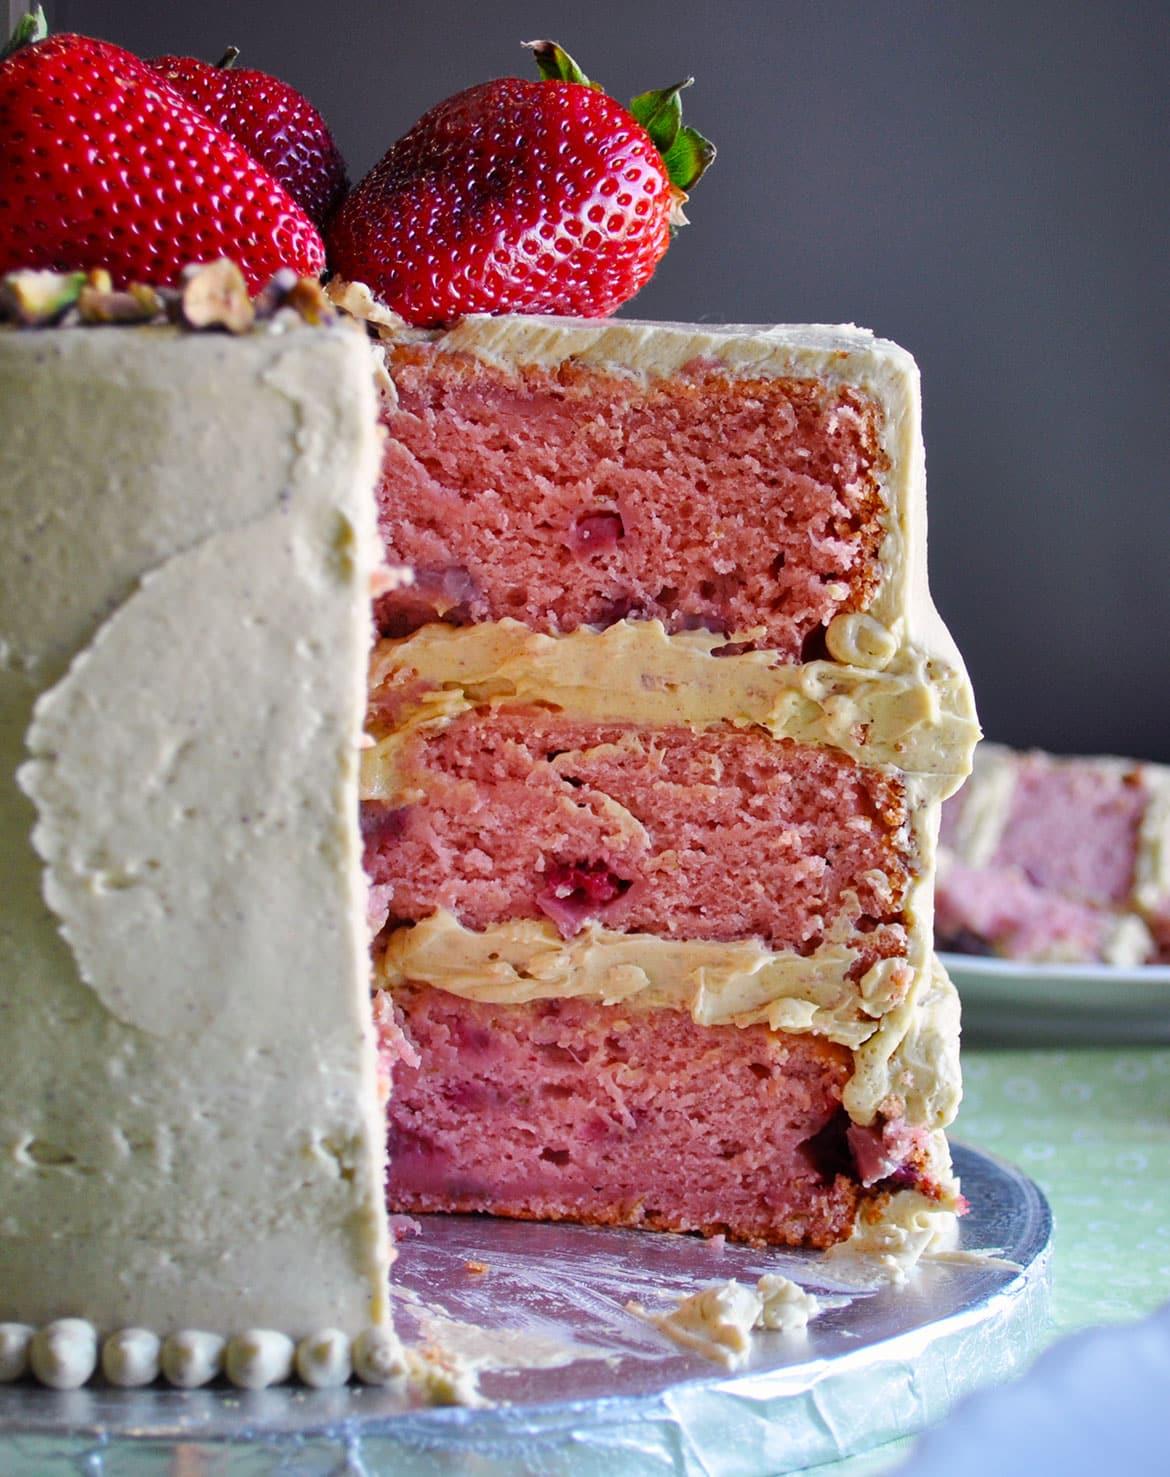 The Best fresh Strawberry Cake with Pistachio Buttercream | ofbatteranddough.com